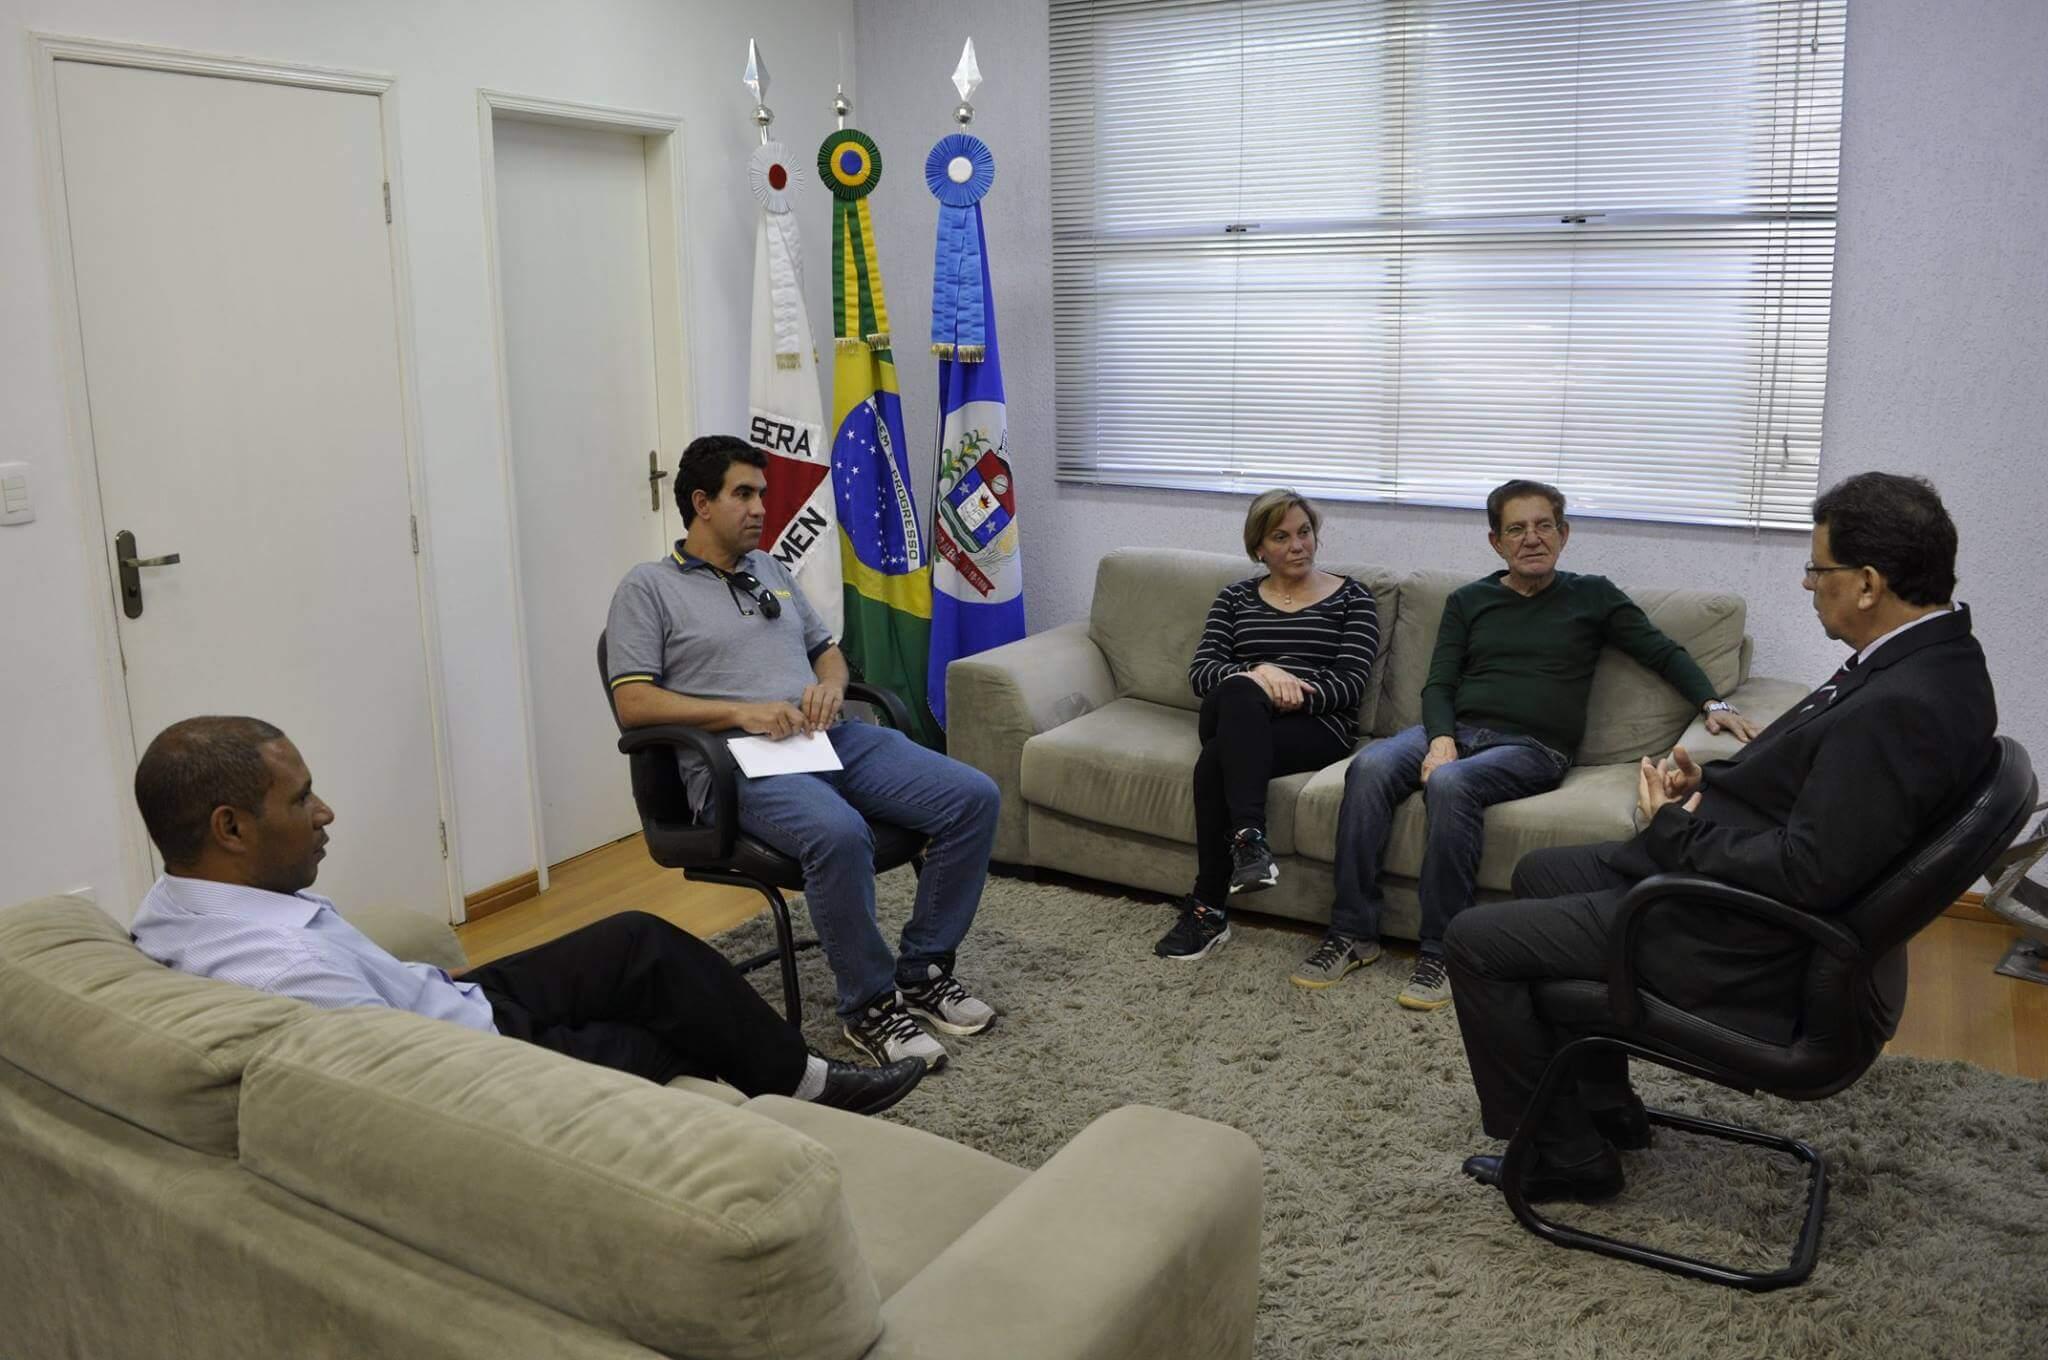 Perugini recebeu o presidente da Câmara, Maurício Tuttye os vereadores Dulcinéia Costa e Gilberto Barreiro (Foto: Prefeitura)